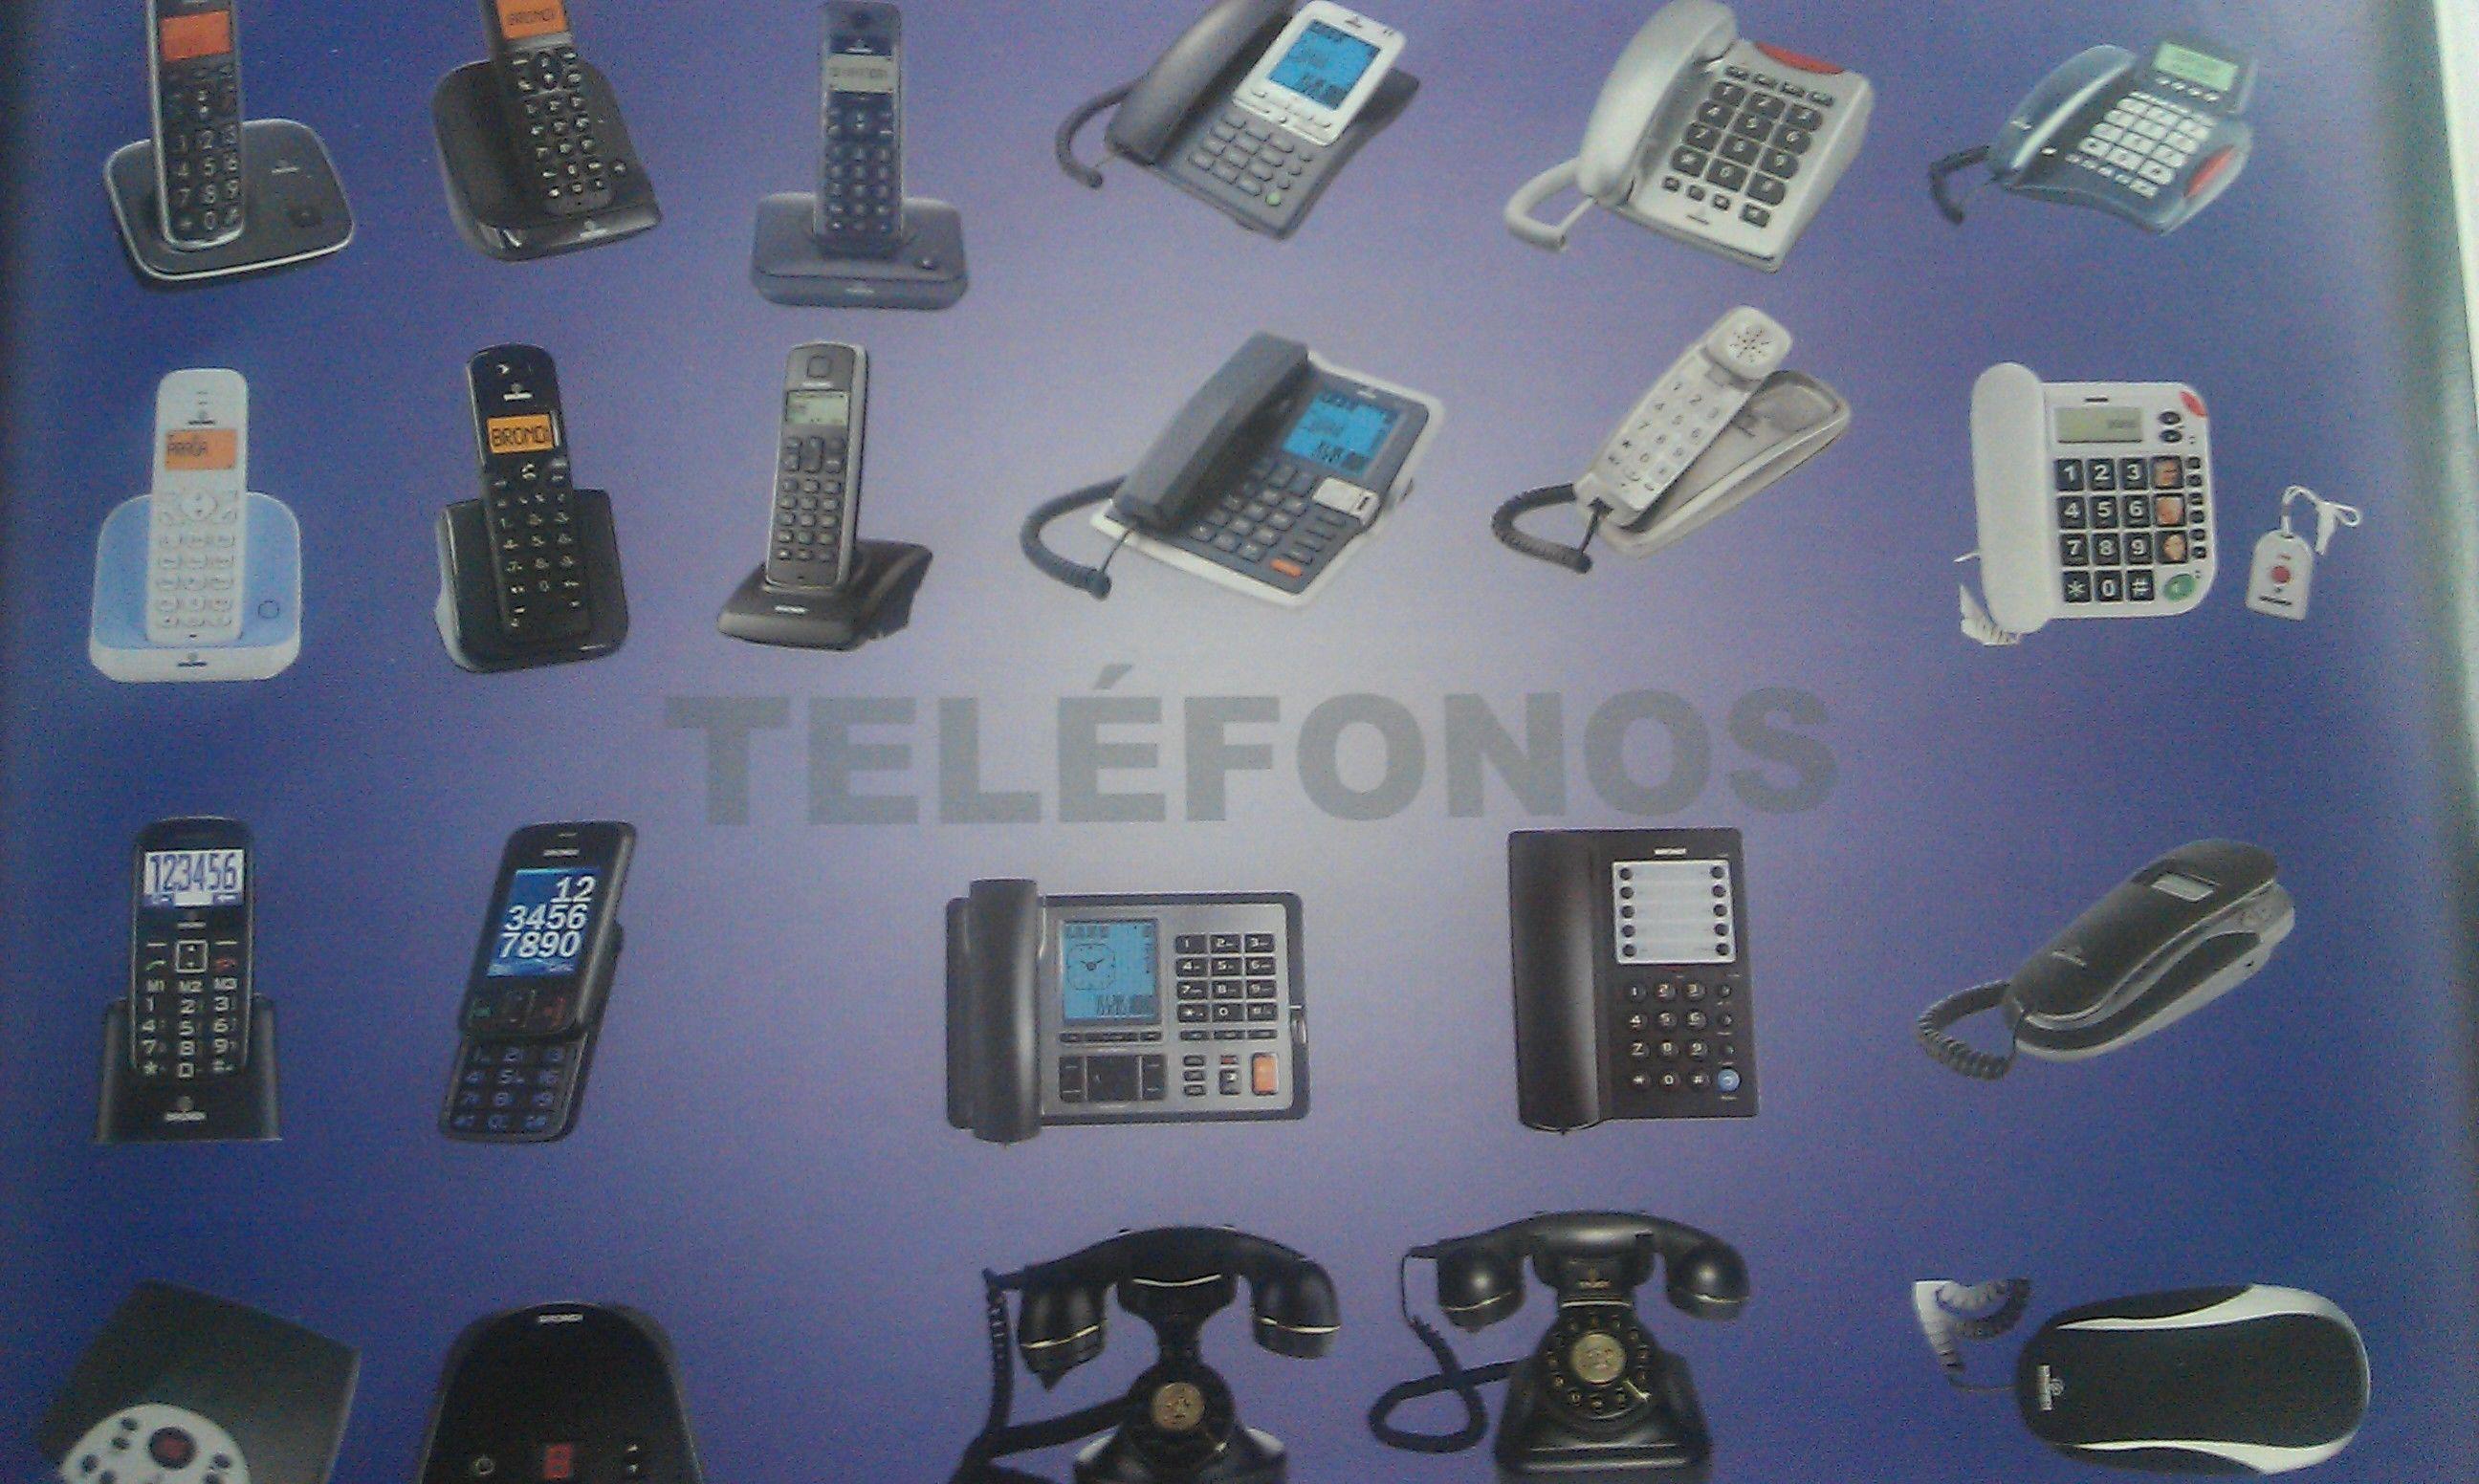 TELEFONIA : Catálogo de Olanni Electronics